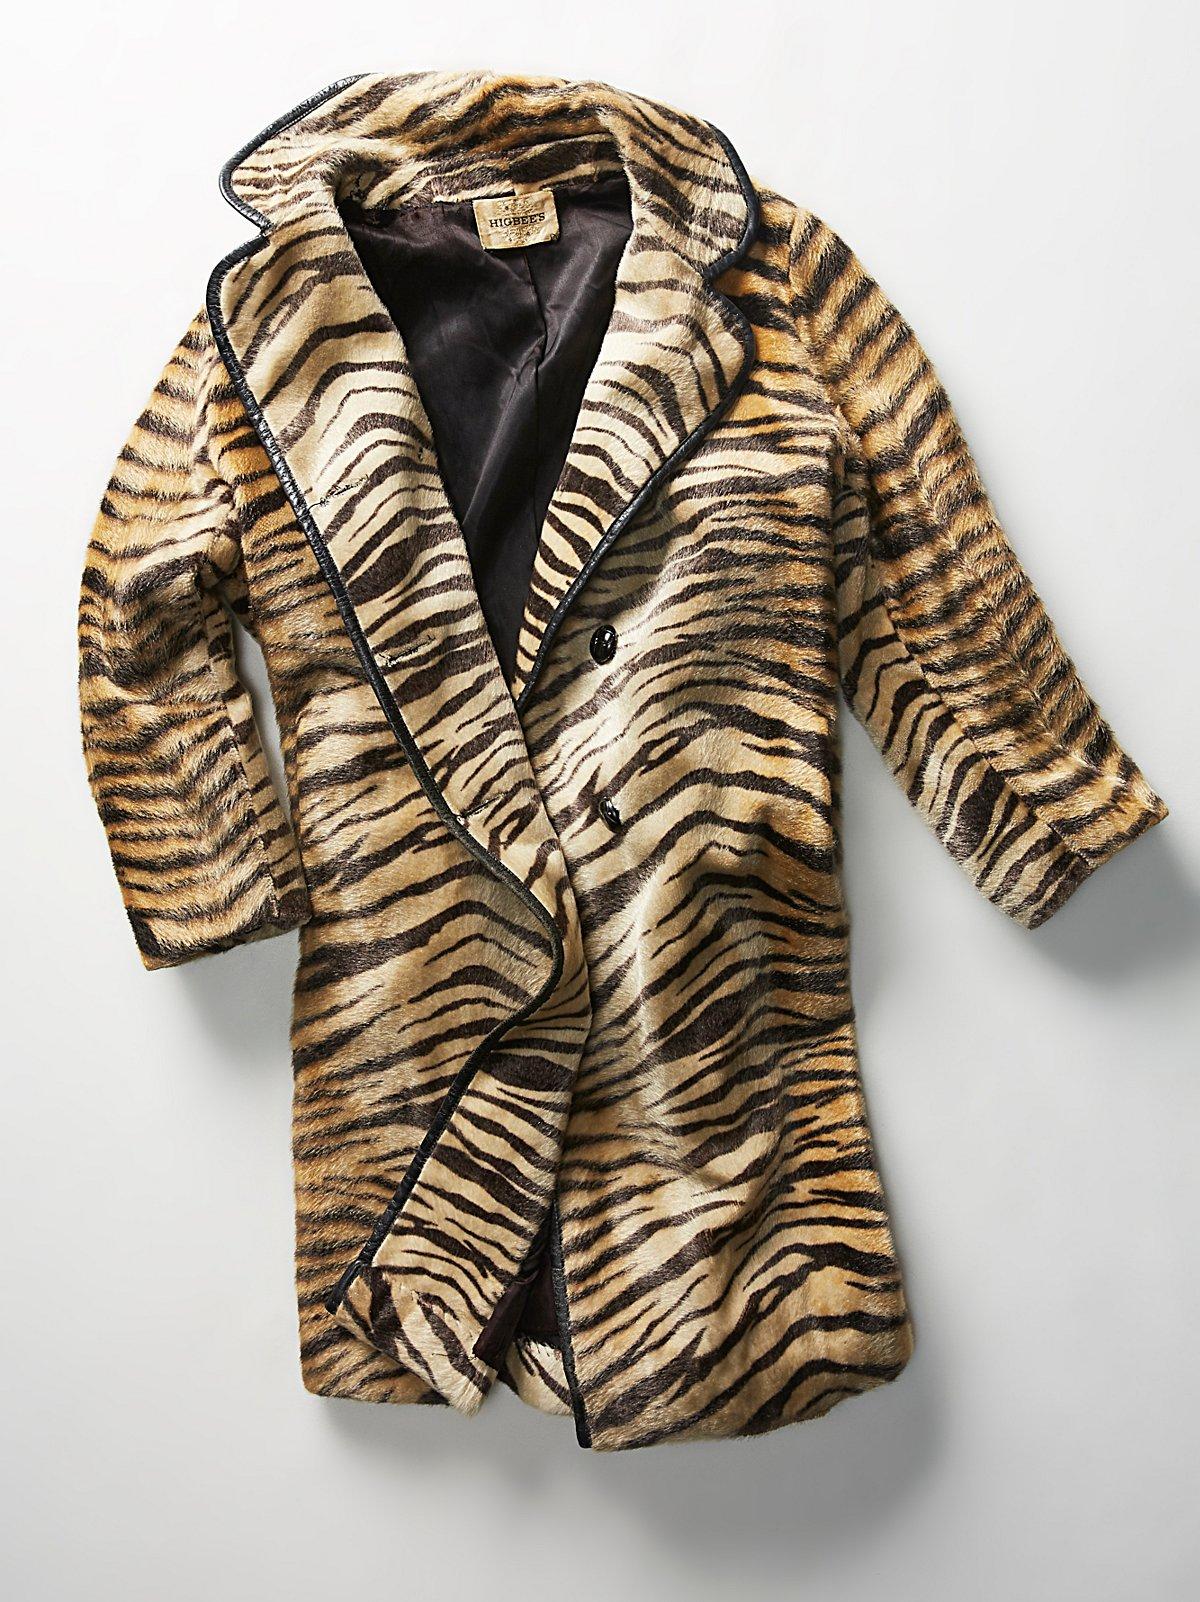 Vintage 1960s Zebra Swing Coat